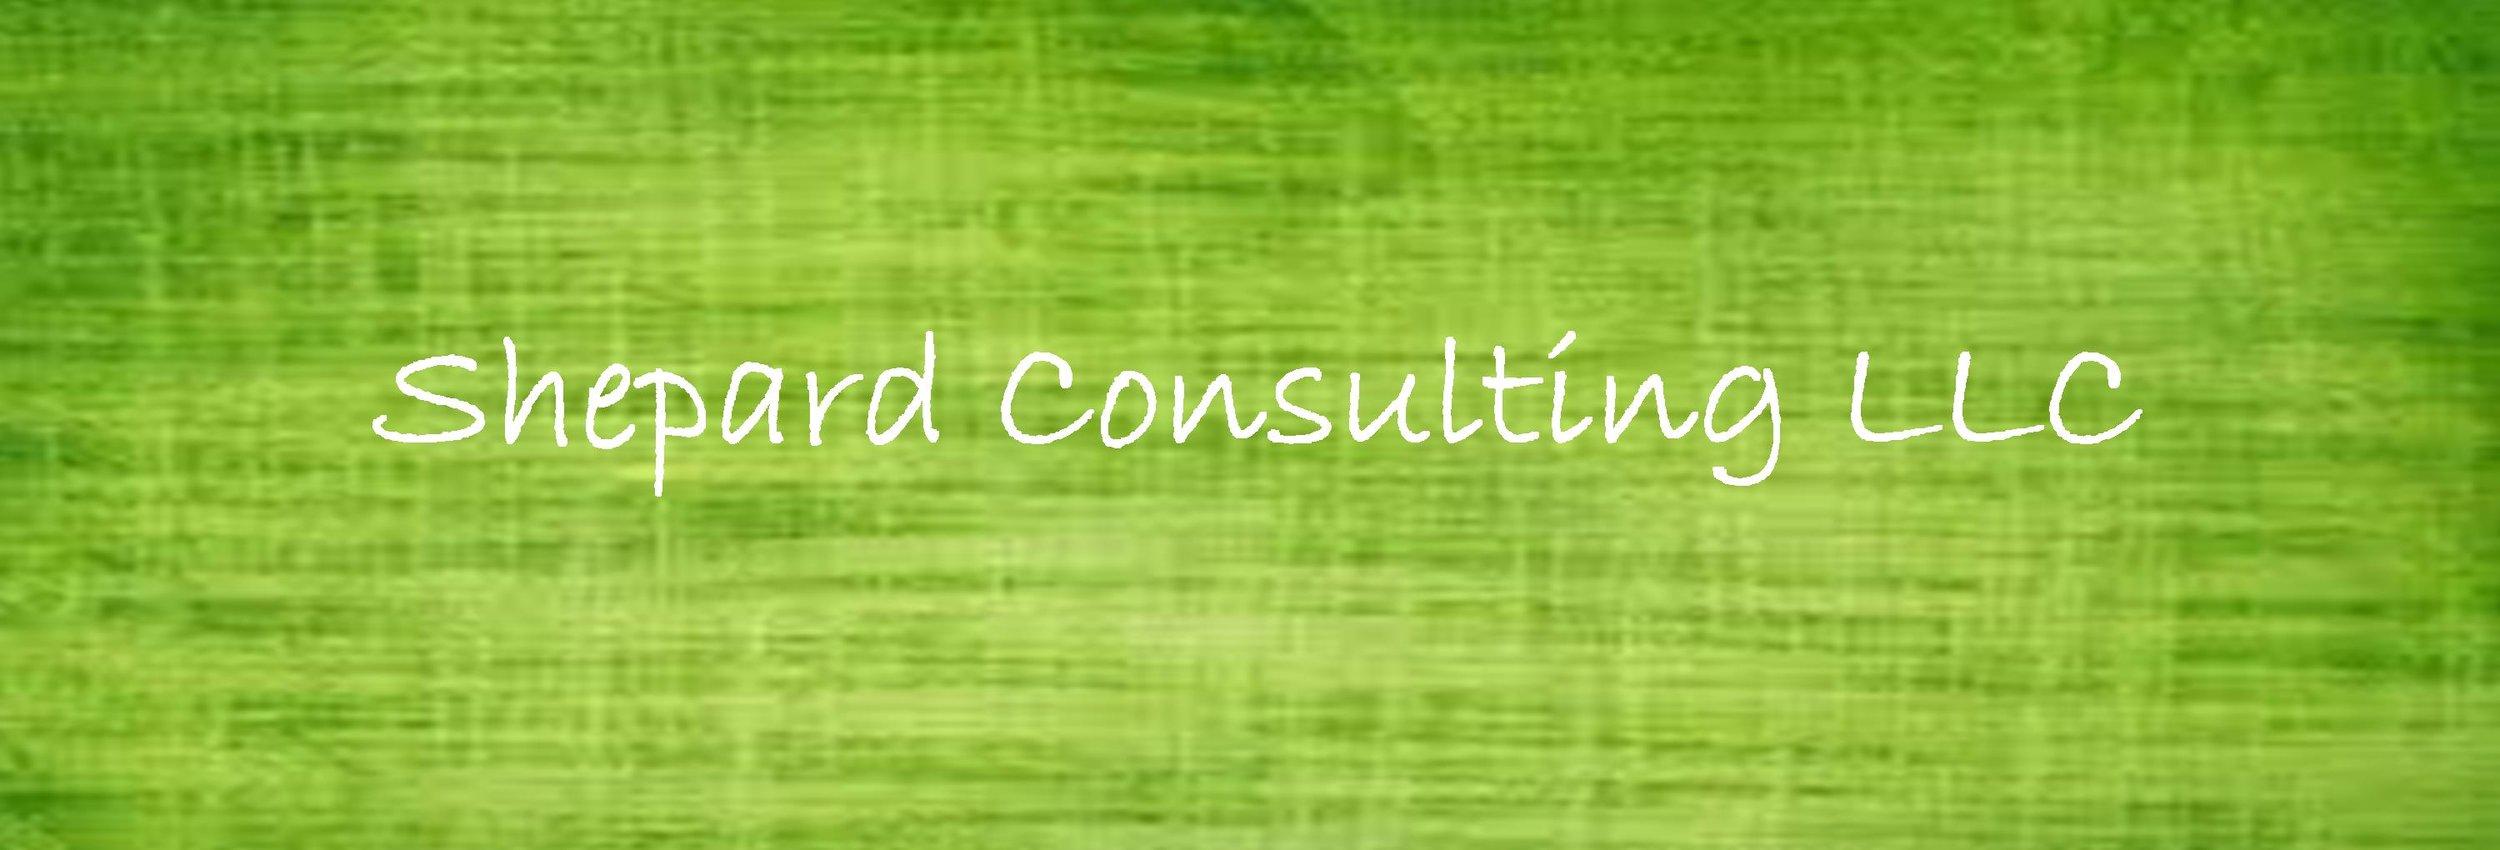 Shepard Consulting LLC.jpg